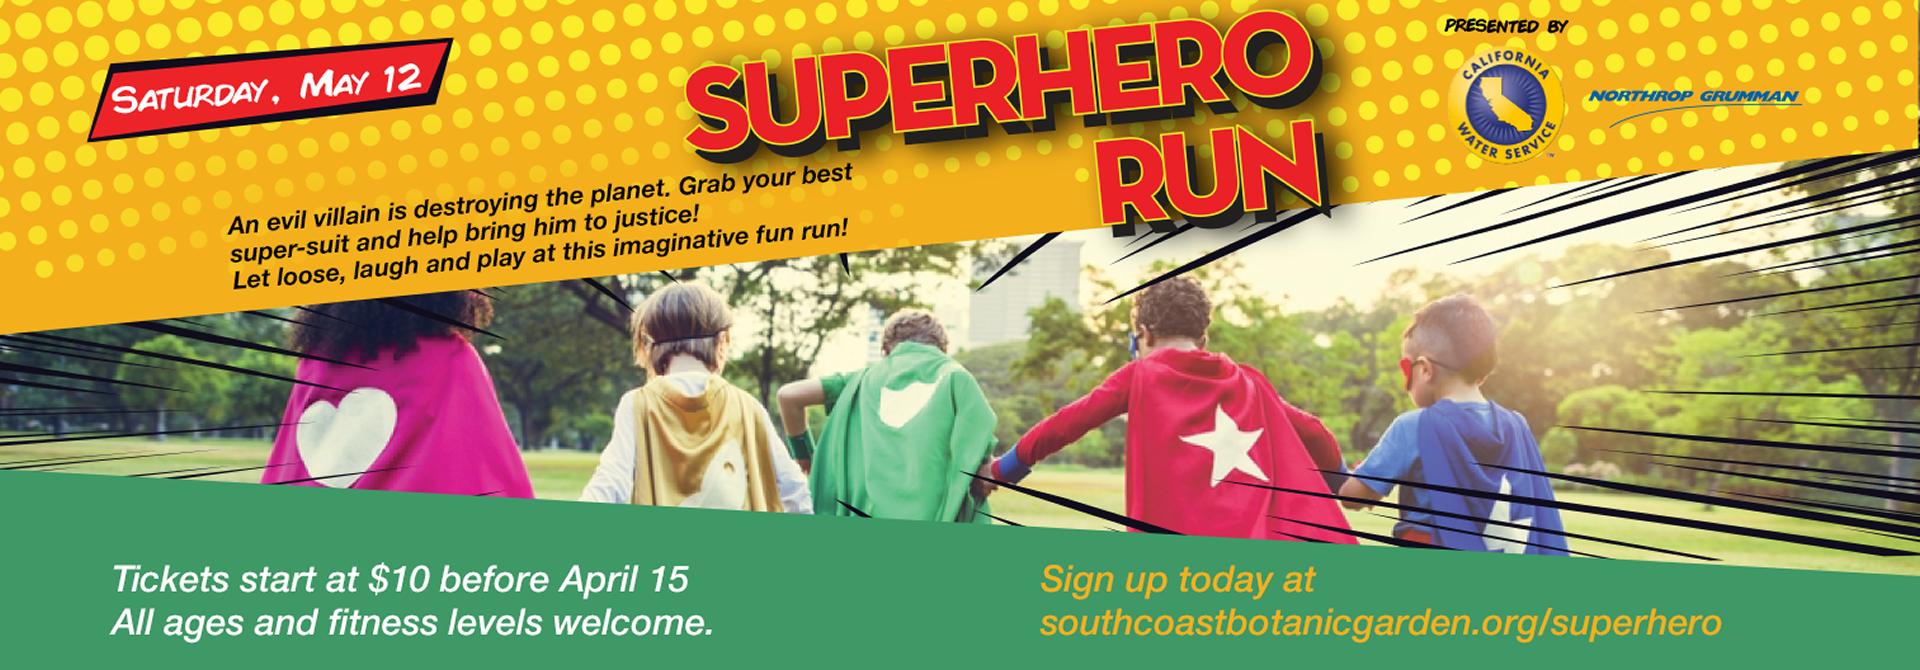 Superhero Run